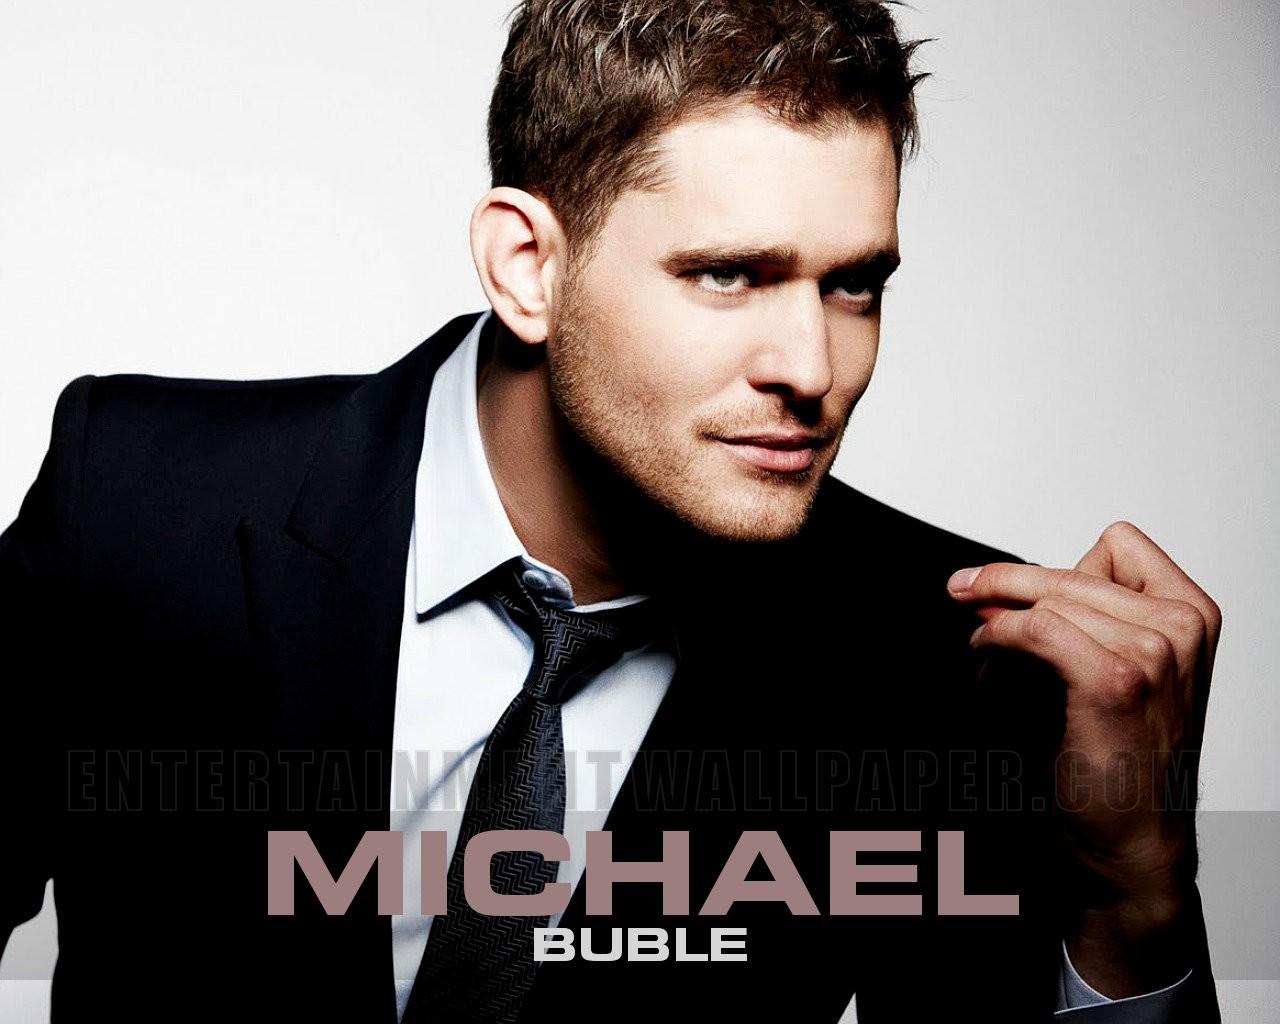 Michael Buble Net Worth